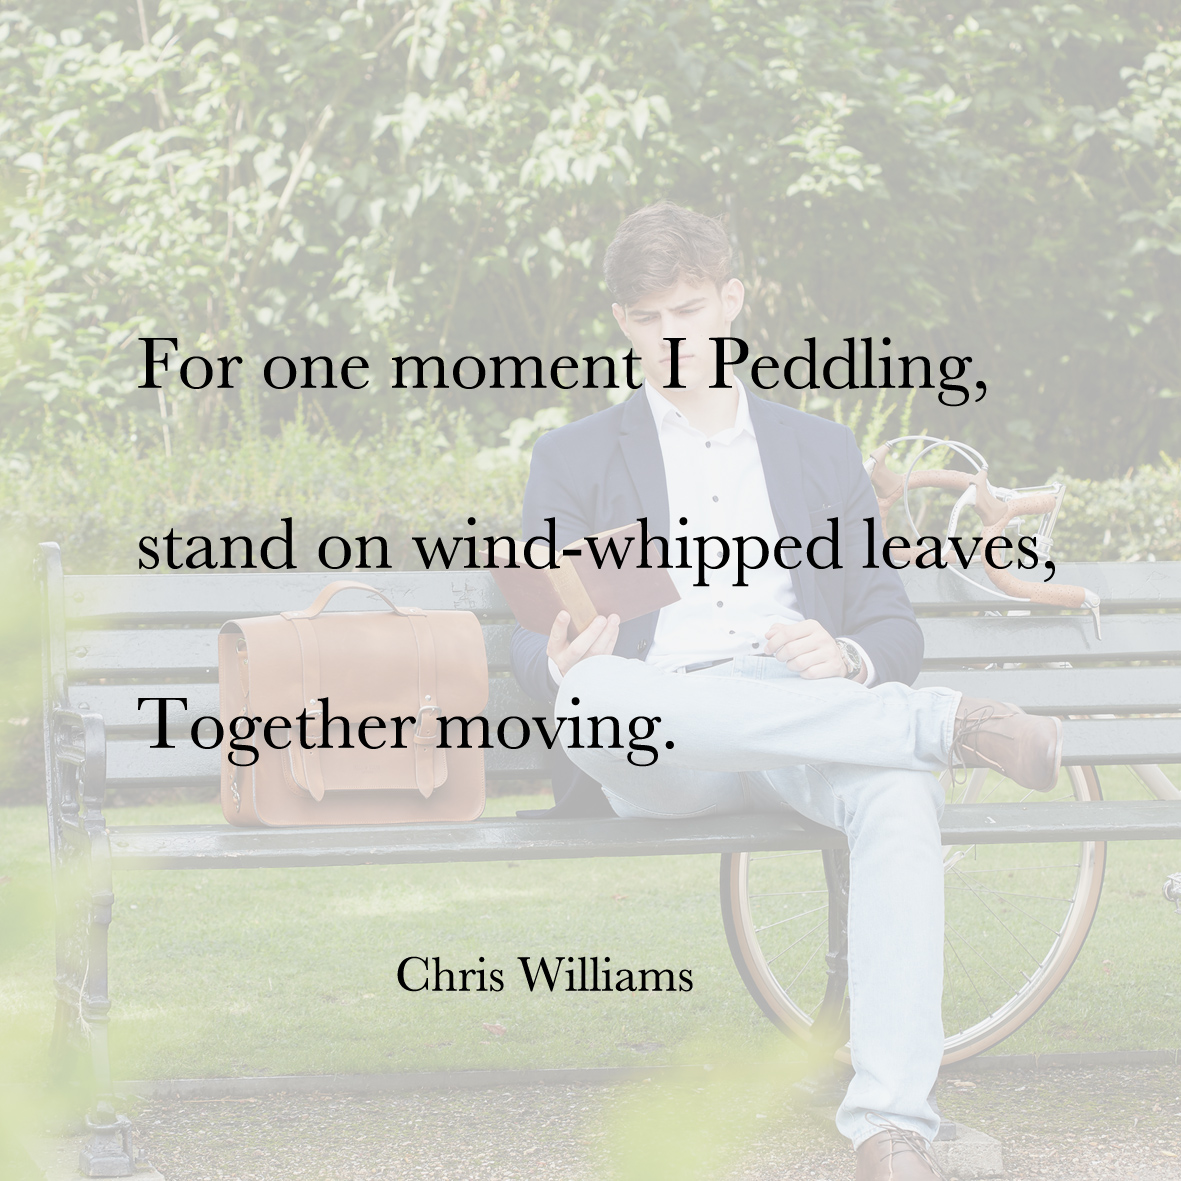 Baiku Chris Williams bike bag poetry